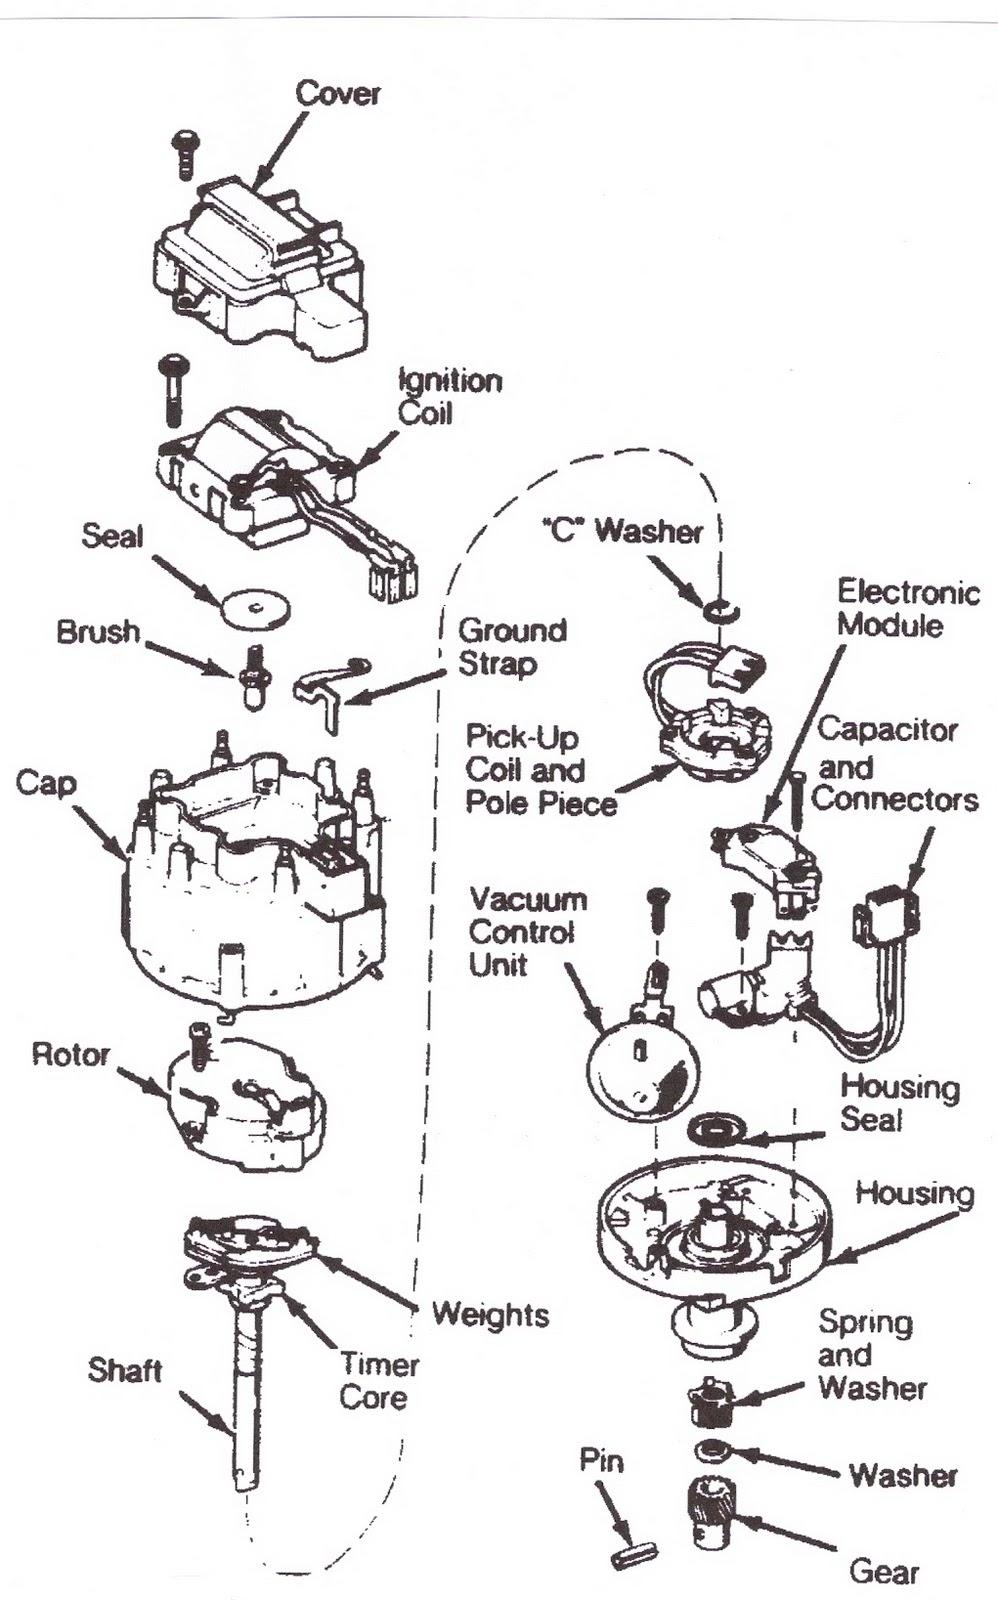 [SCHEMATICS_4LK]  RE_9016] Chevy 305 Hei Distributor Wiring Diagram Schematic Wiring   Chevy 305 Hei Distributor Wiring Diagram      Aryon Pila Props Eumqu Tivexi Kumb Denli Mohammedshrine Librar Wiring 101